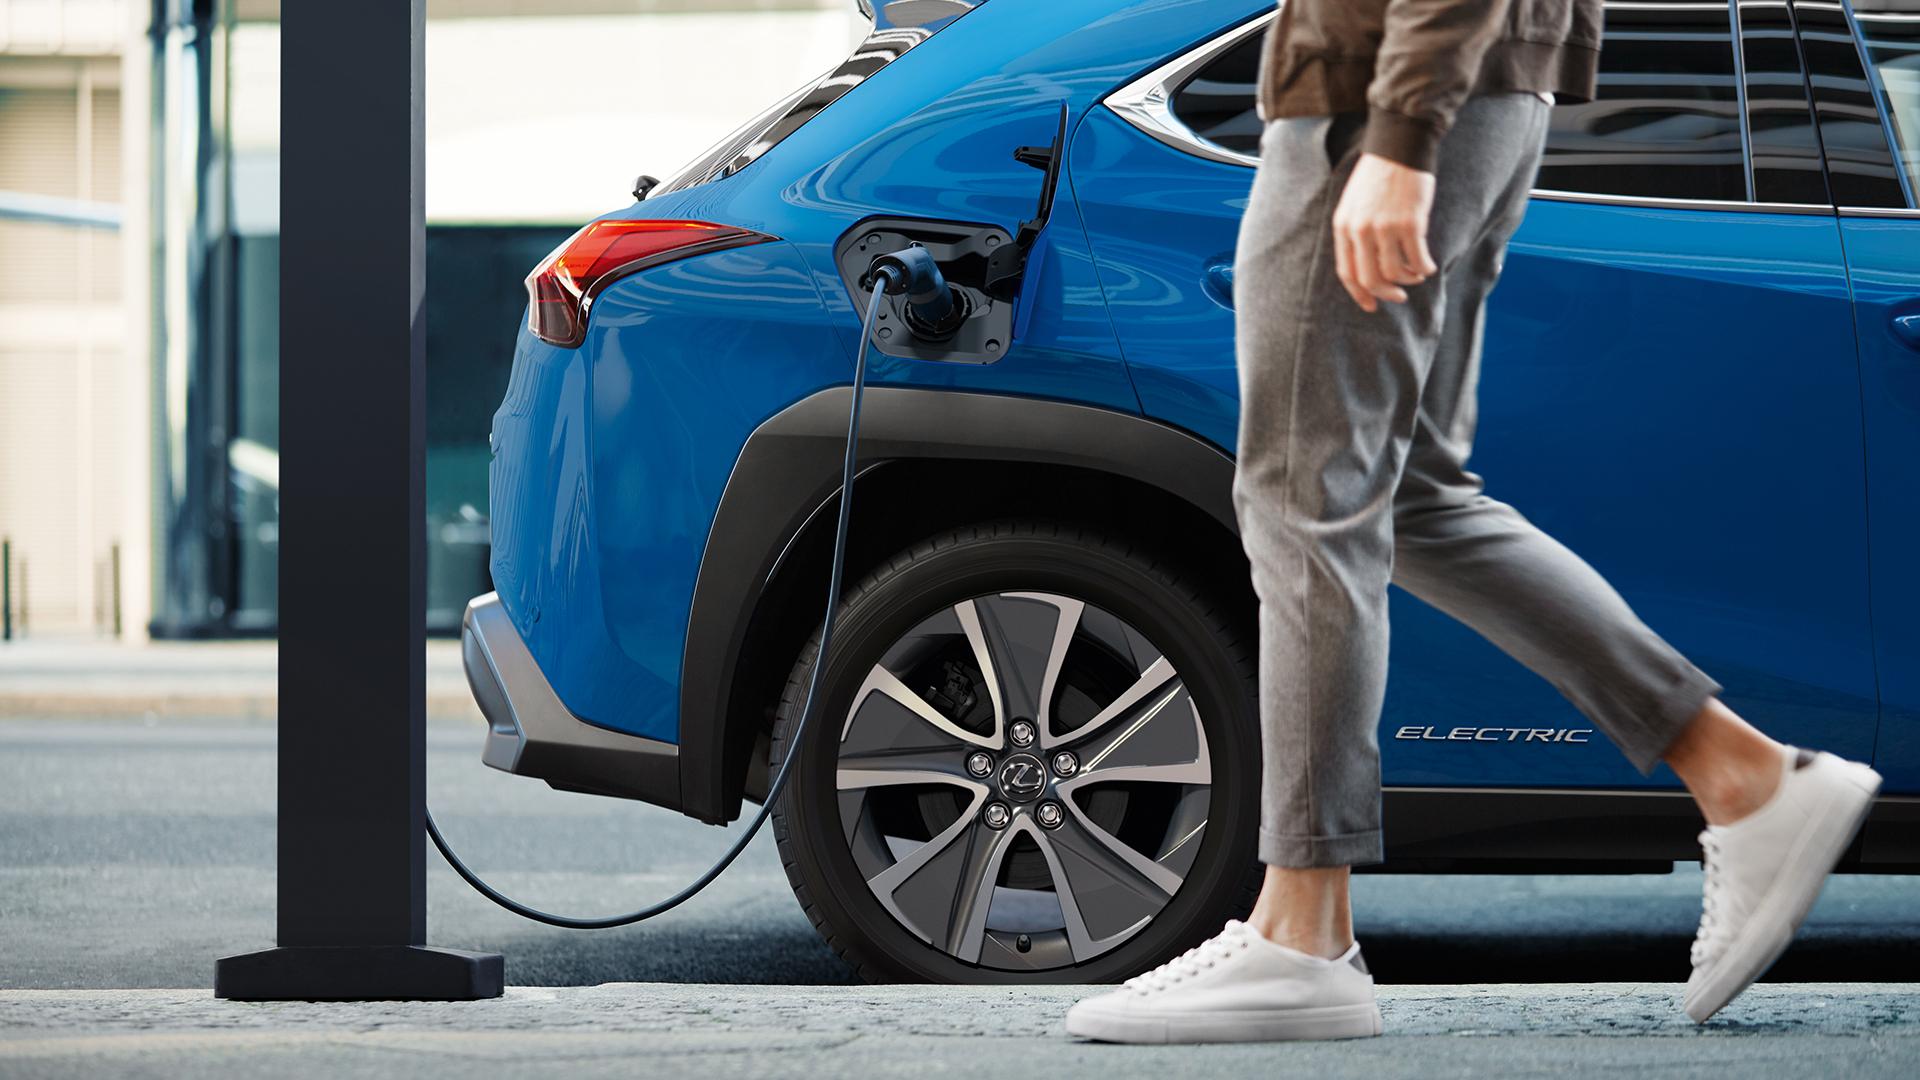 2021 lexus public charging dc charging poster